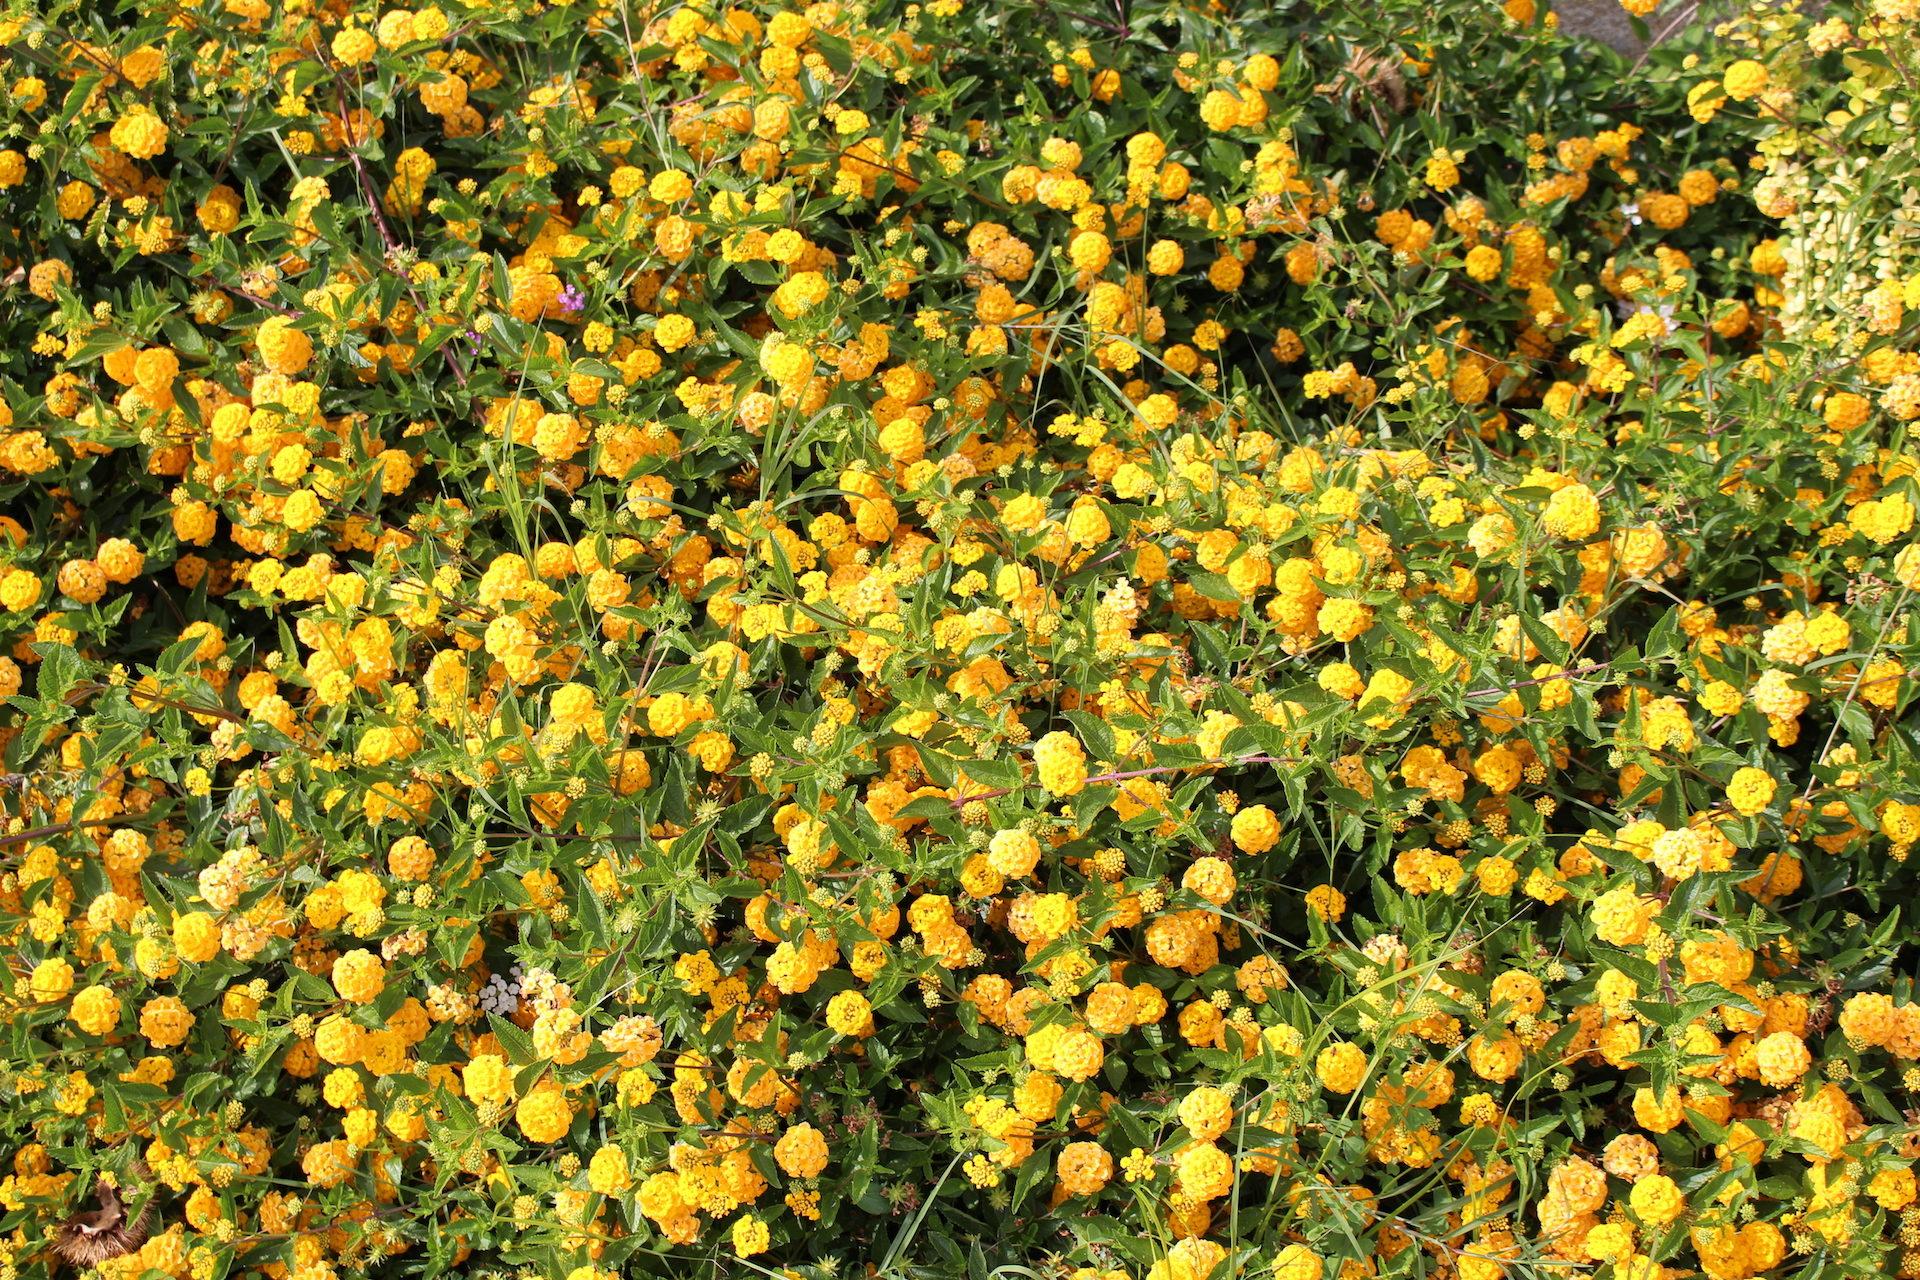 fleurs, plantes, abondance, Ramos, Jaune - Fonds d'écran HD - Professor-falken.com